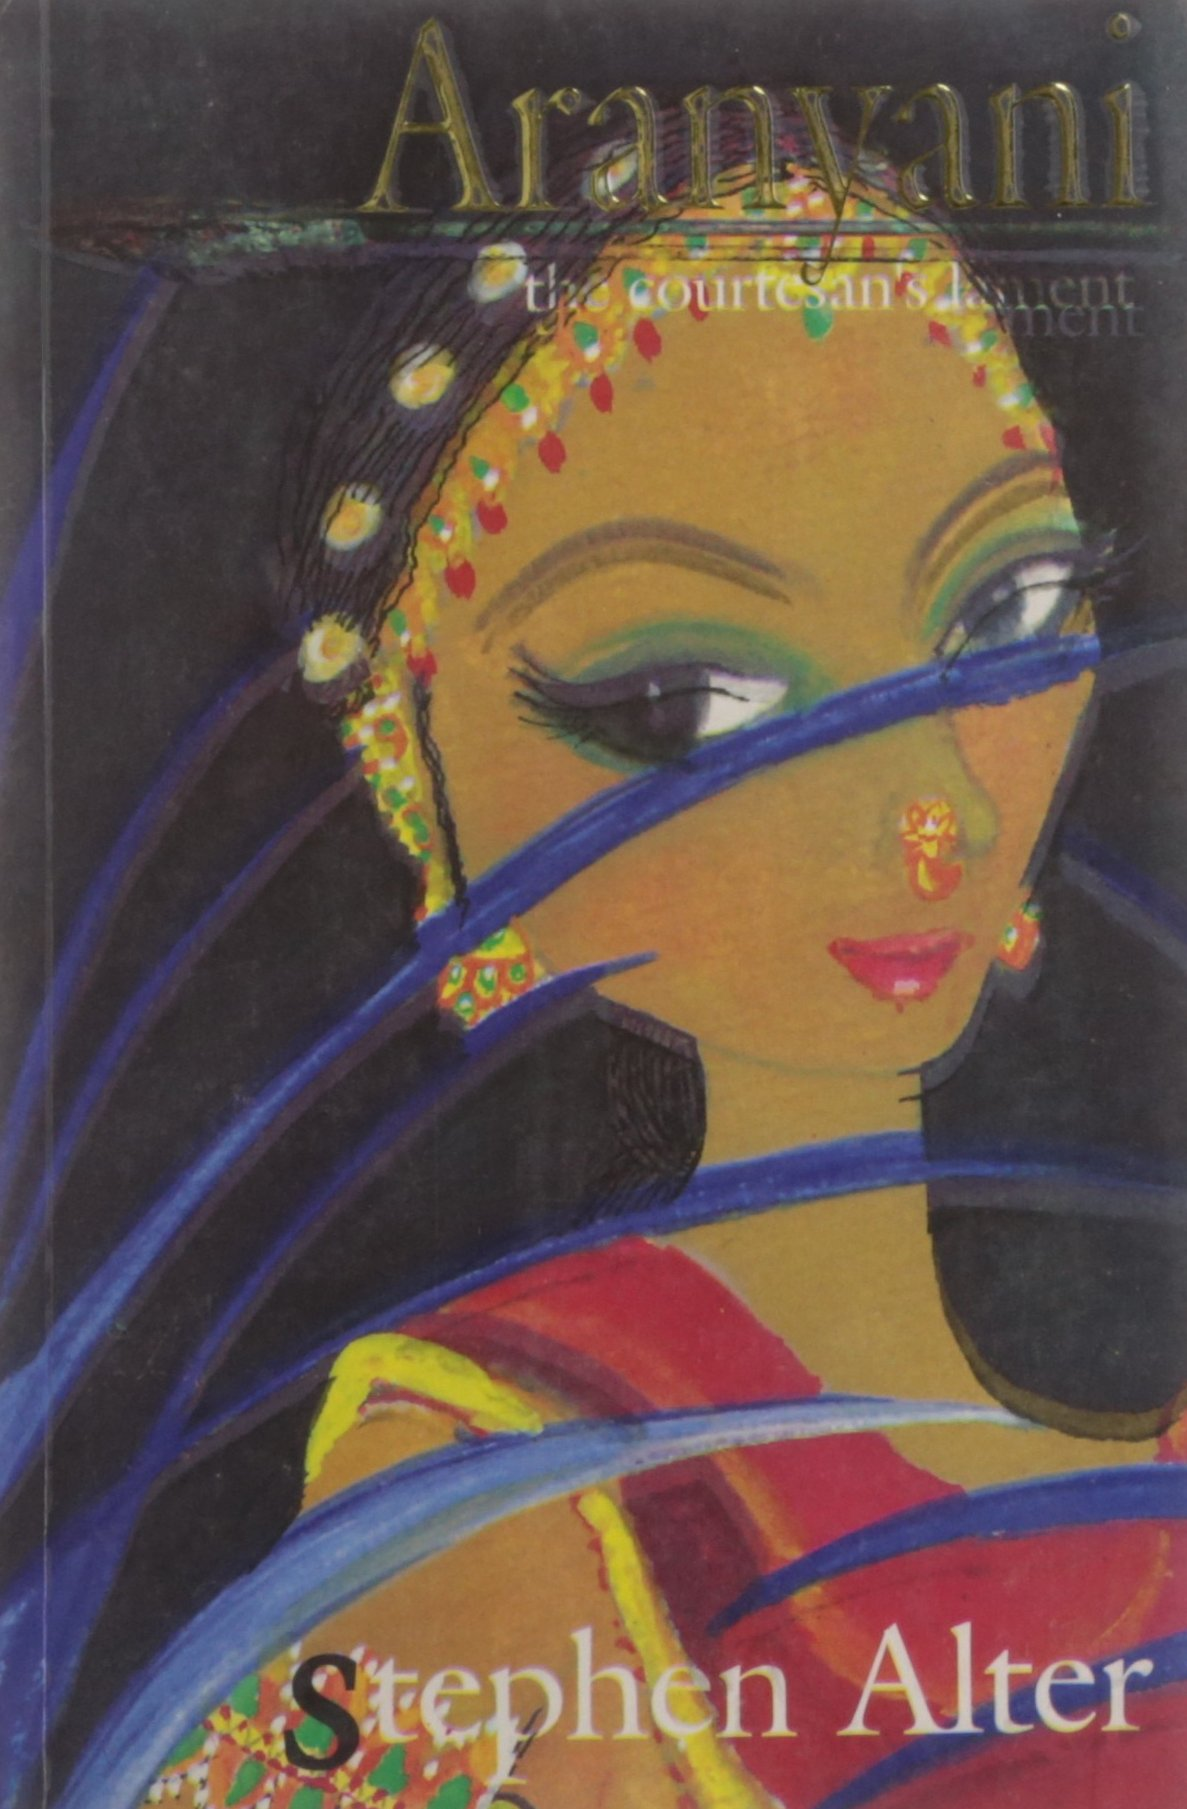 Aranyani : The Courtesan's Lament ; A Romance of Ancient India pdf epub